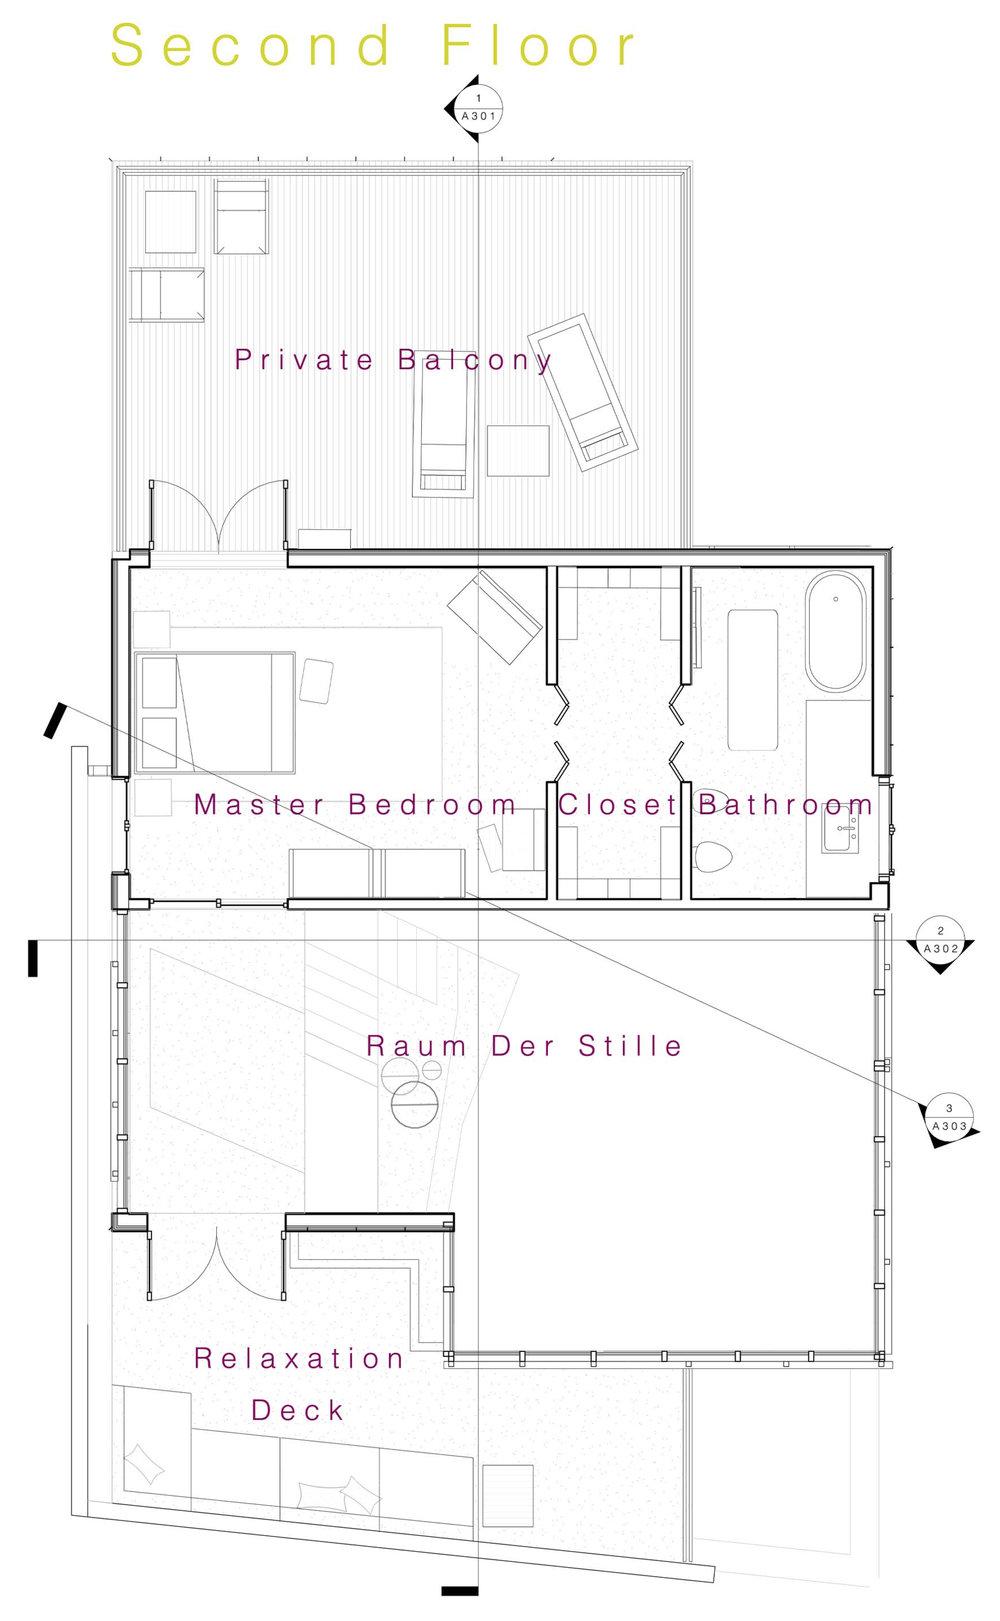 Muse Wiring Diagram Floor Plan